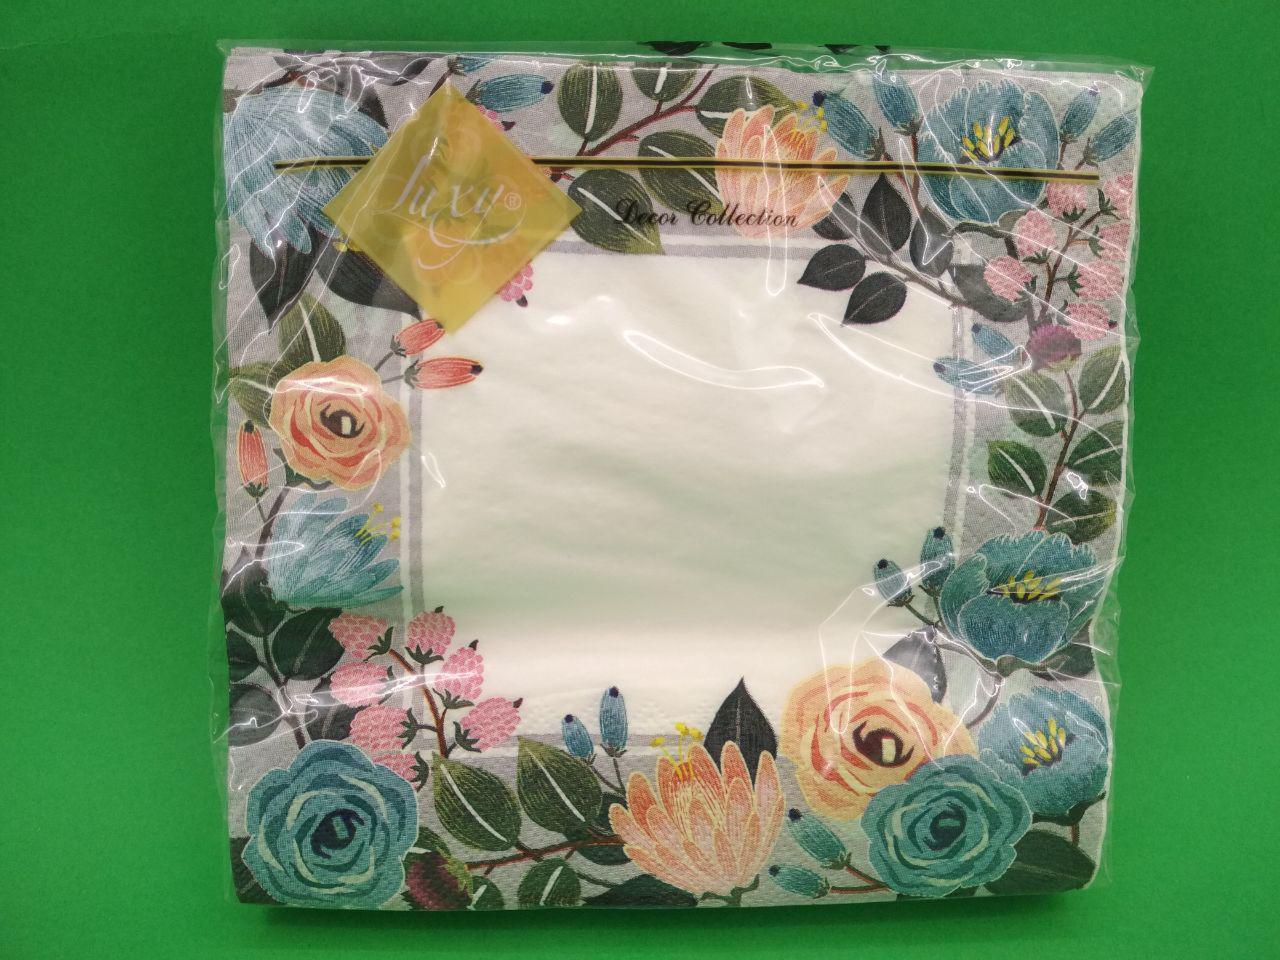 Салфетка (ЗЗхЗЗ, 20шт) Luxy  Рамка из цветов(1239) (1 пач)